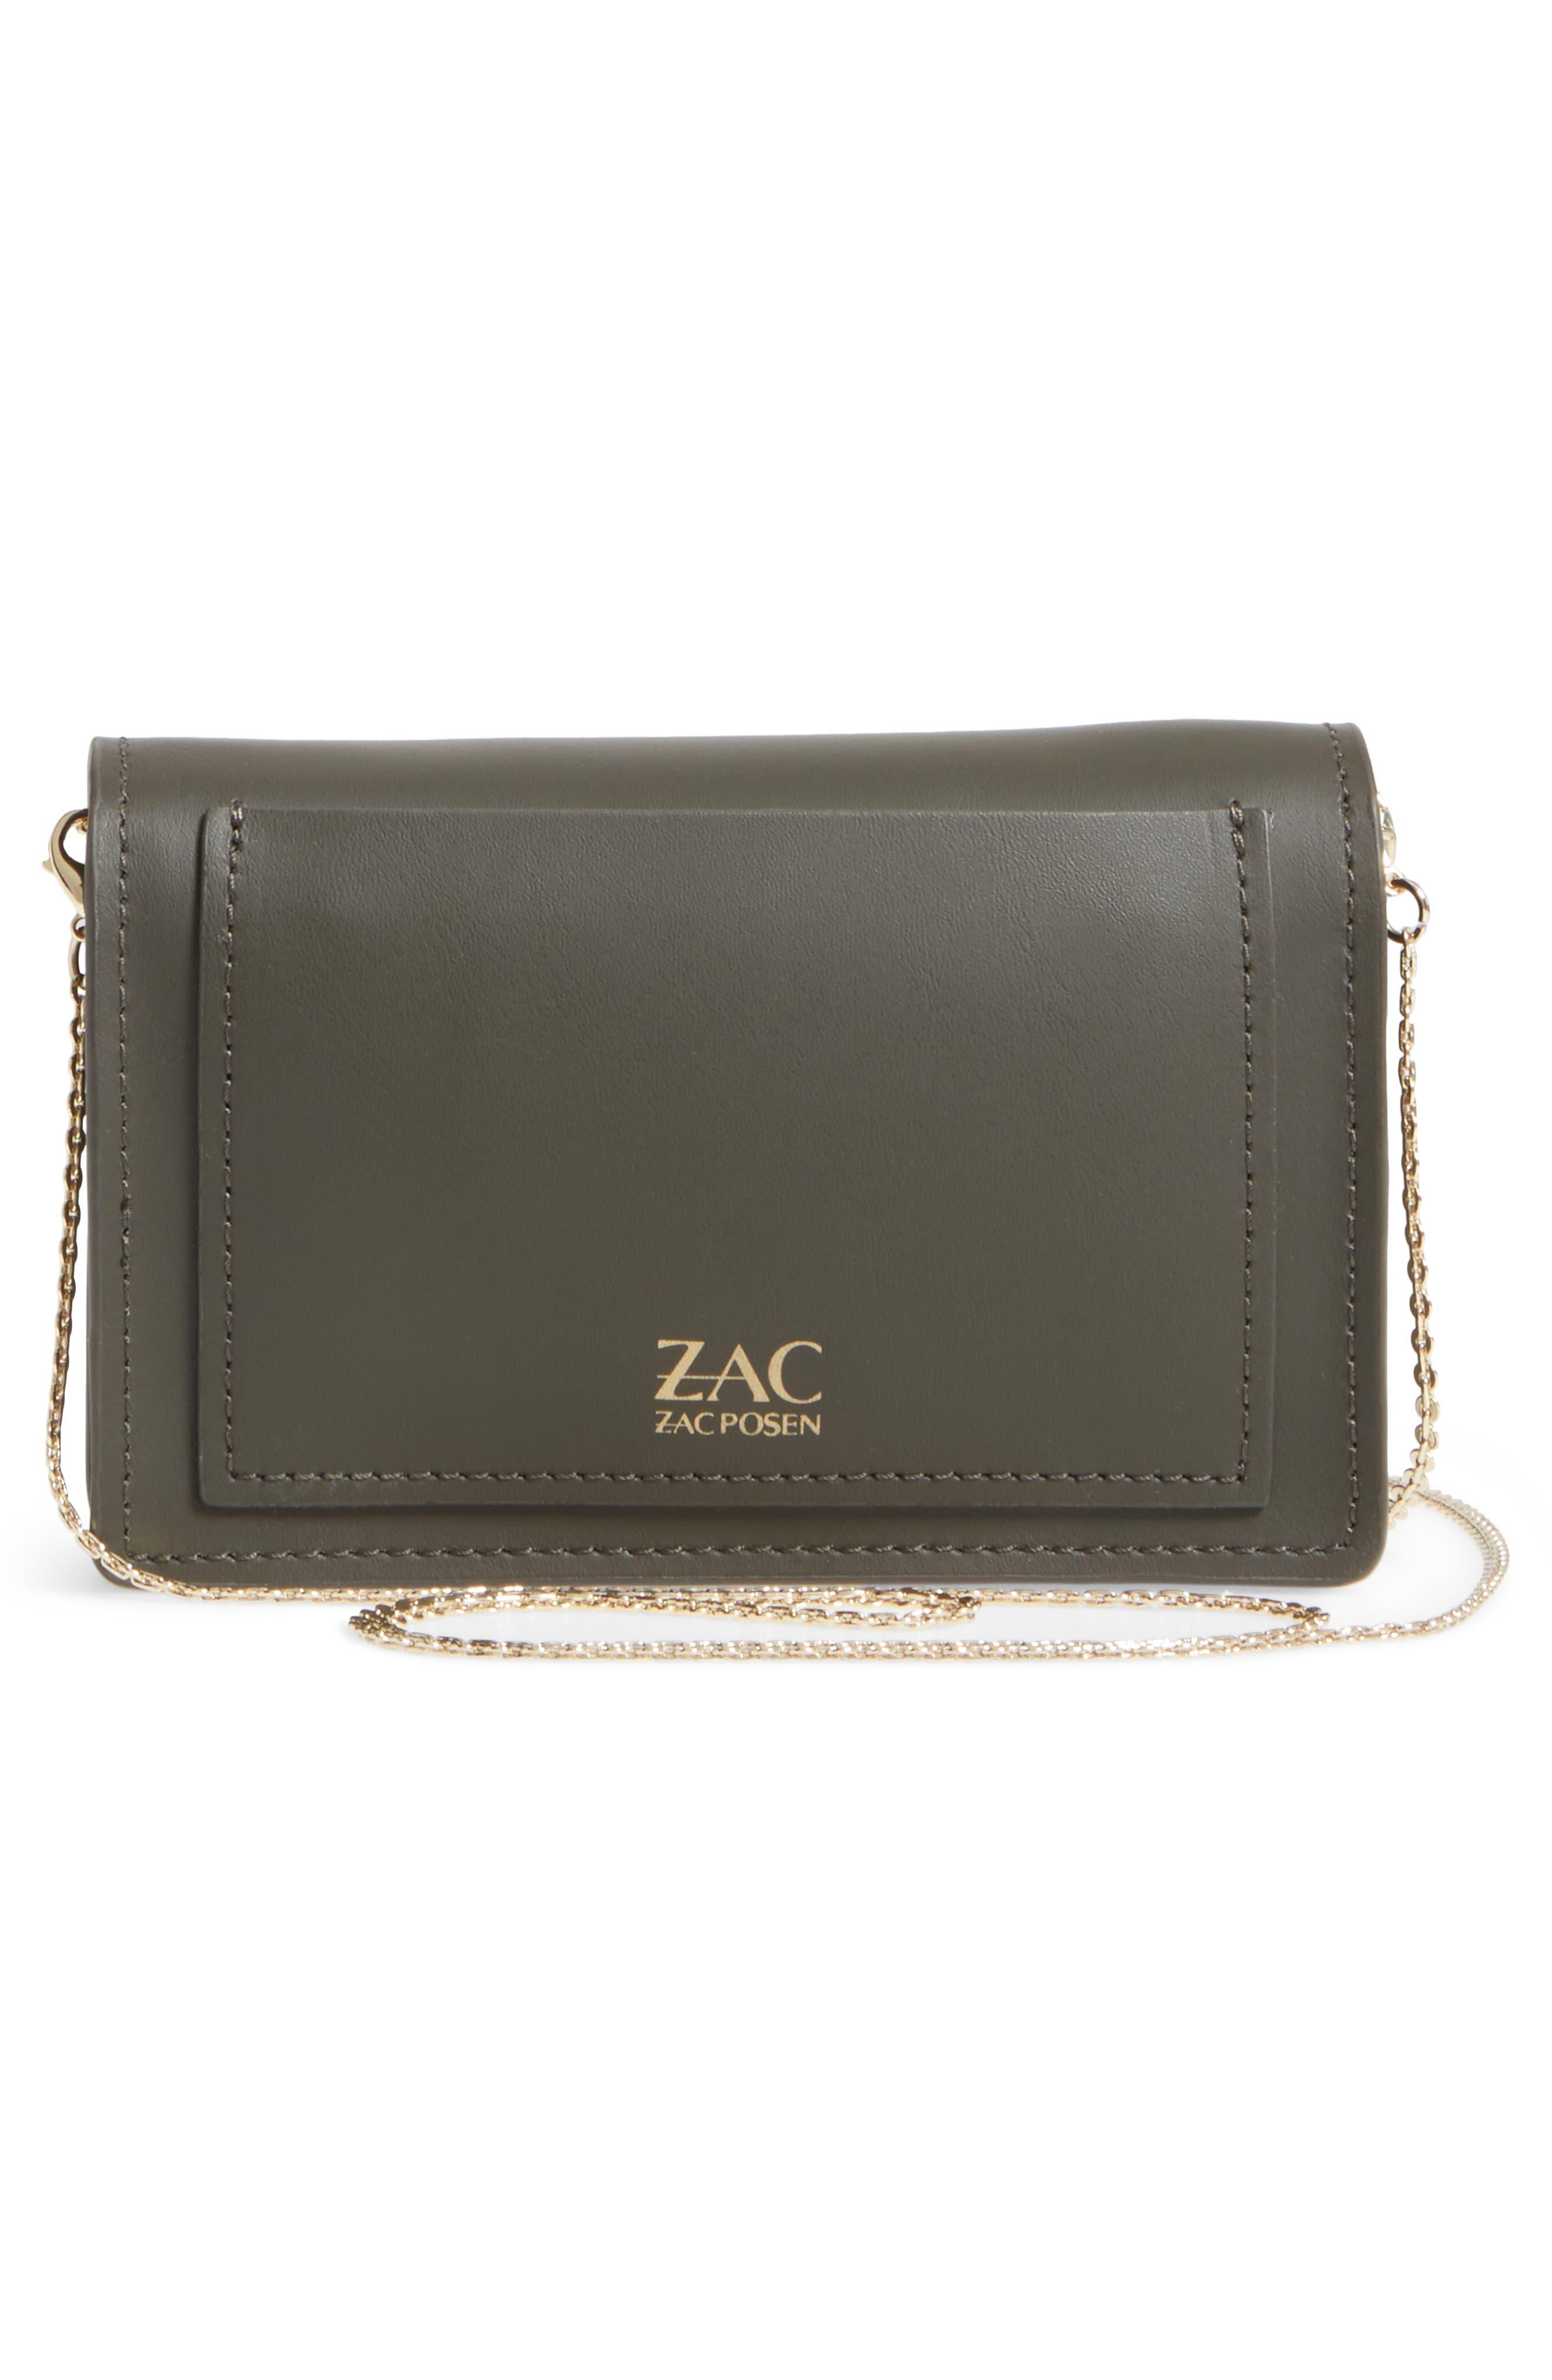 ZAC Zac Posen Earthette Leather Accordion Bag,                             Alternate thumbnail 3, color,                             300